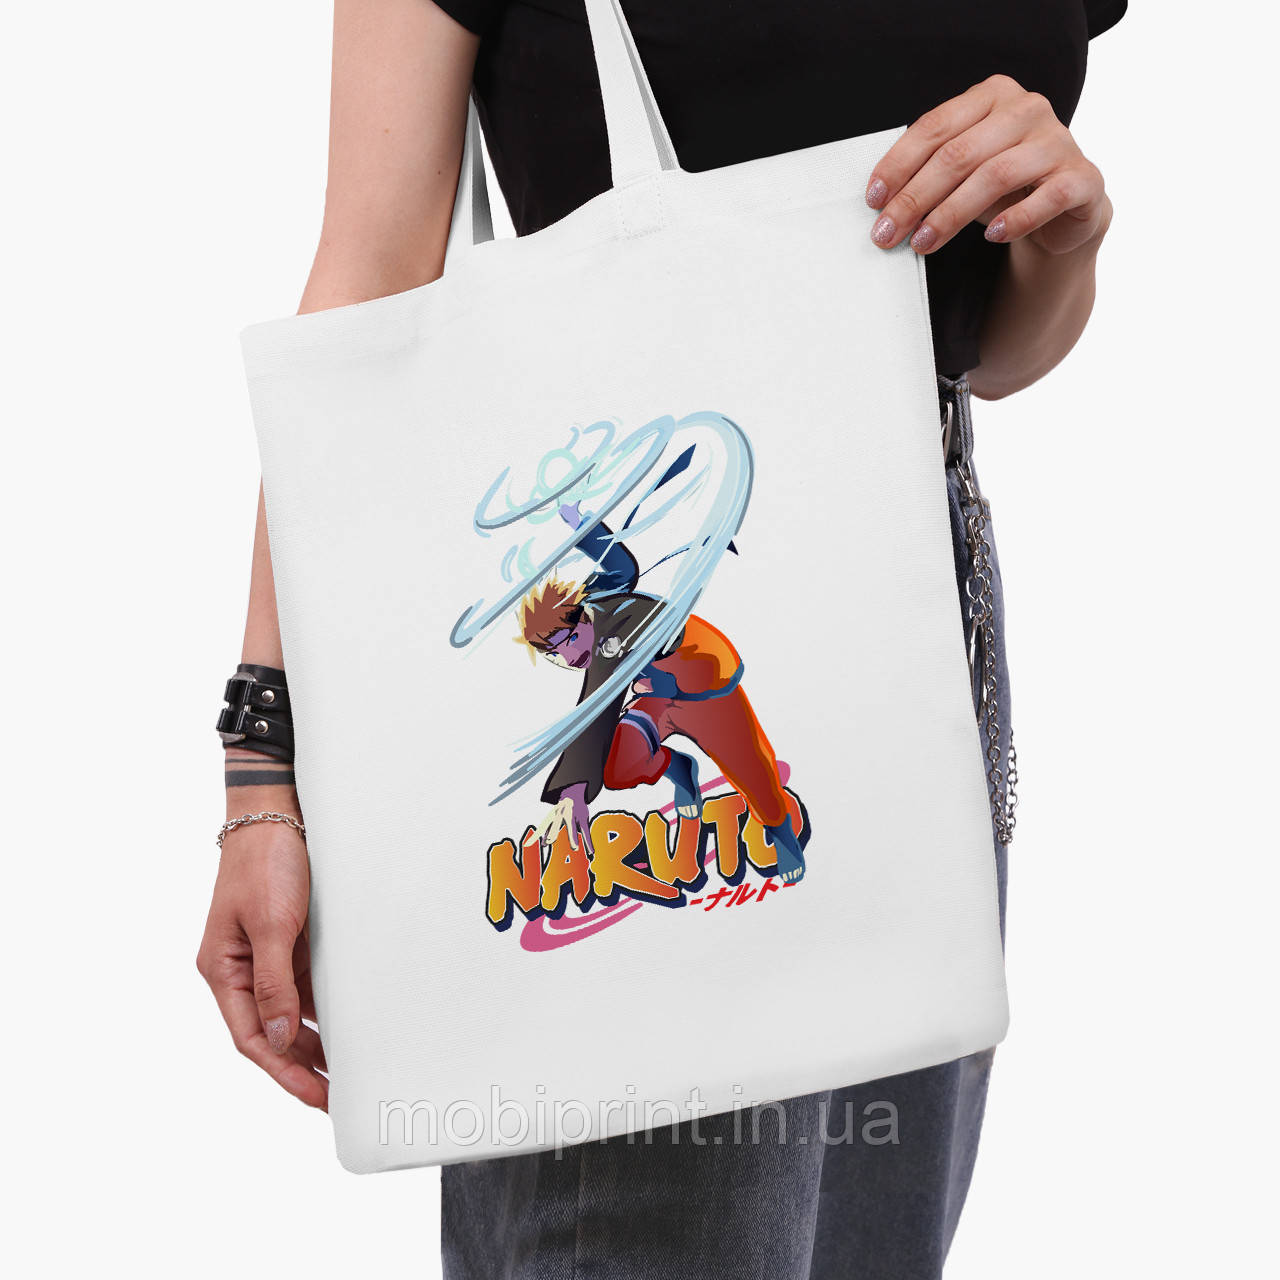 Еко сумка шоппер біла Наруто Узумакі (Naruto Uzumaki) (9227-2814-3) 41*35 см